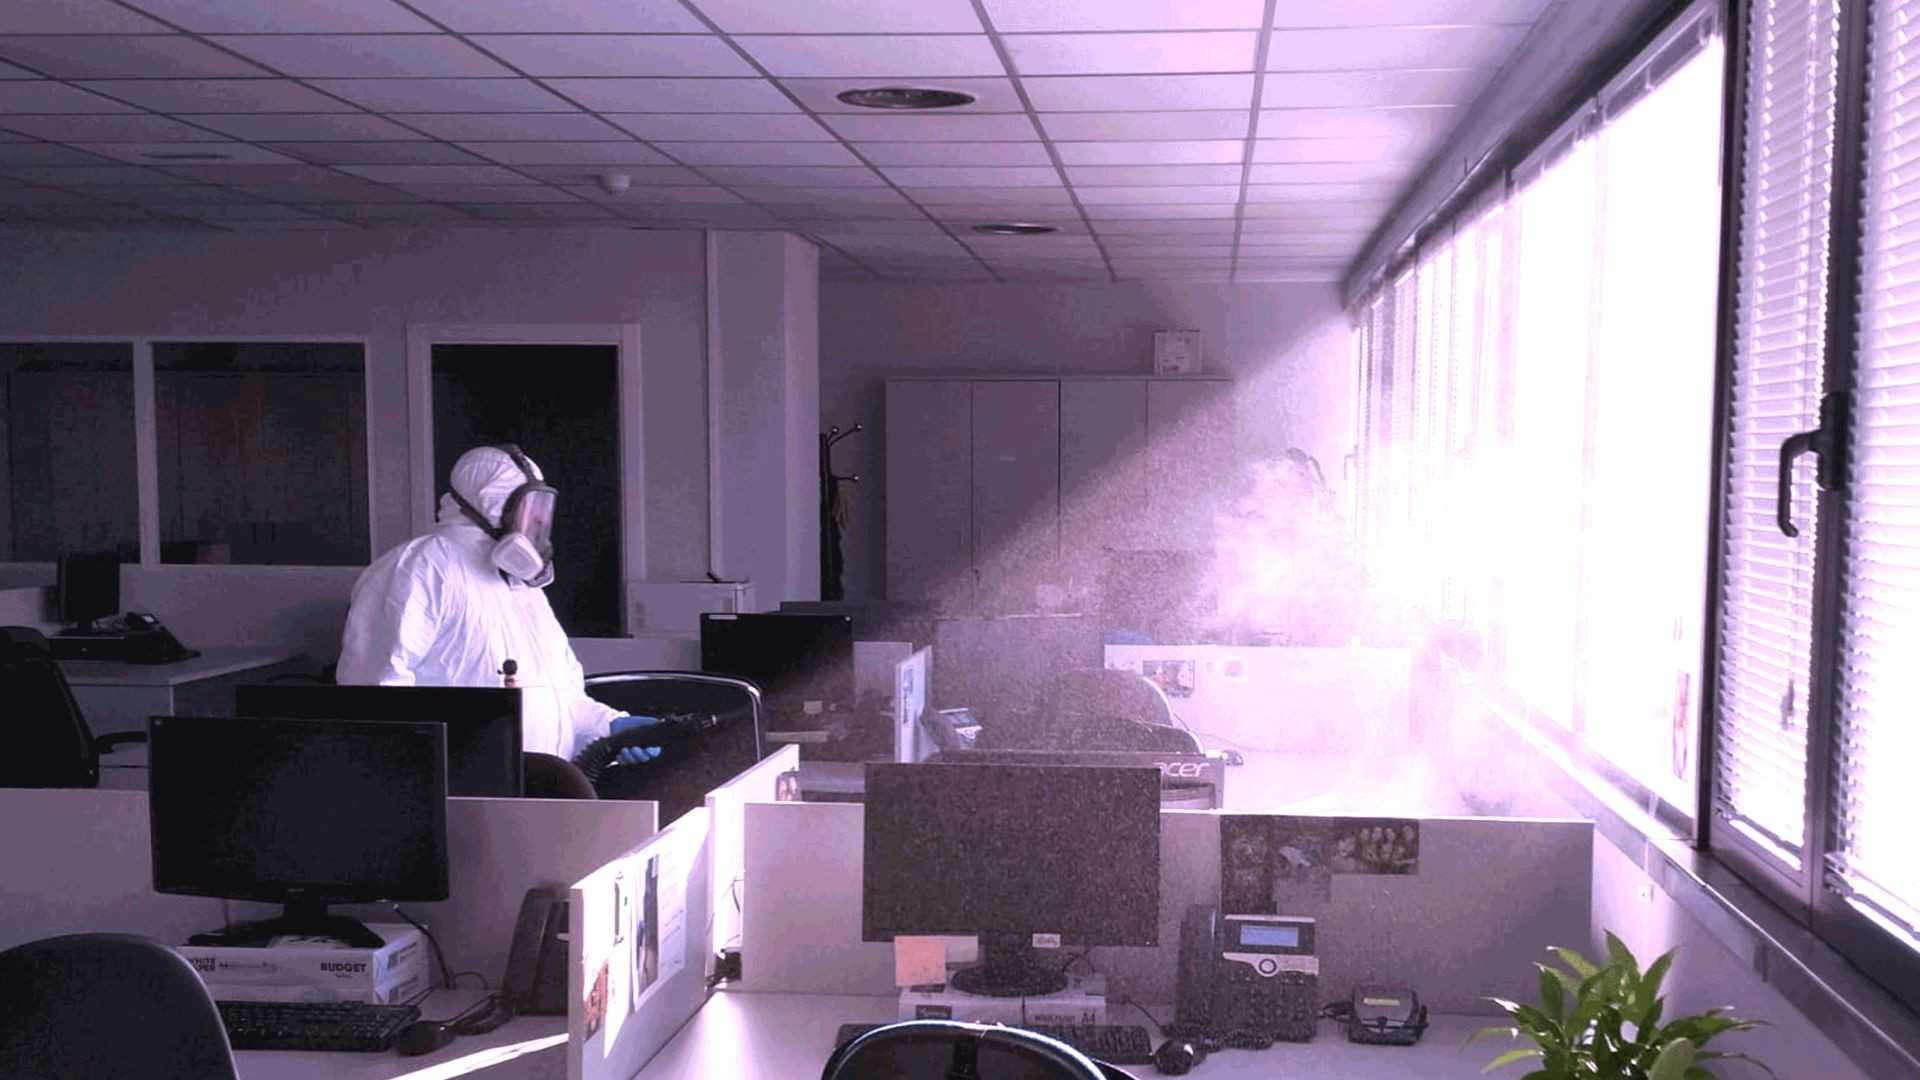 desinfección de amplio rango mediante nebulización